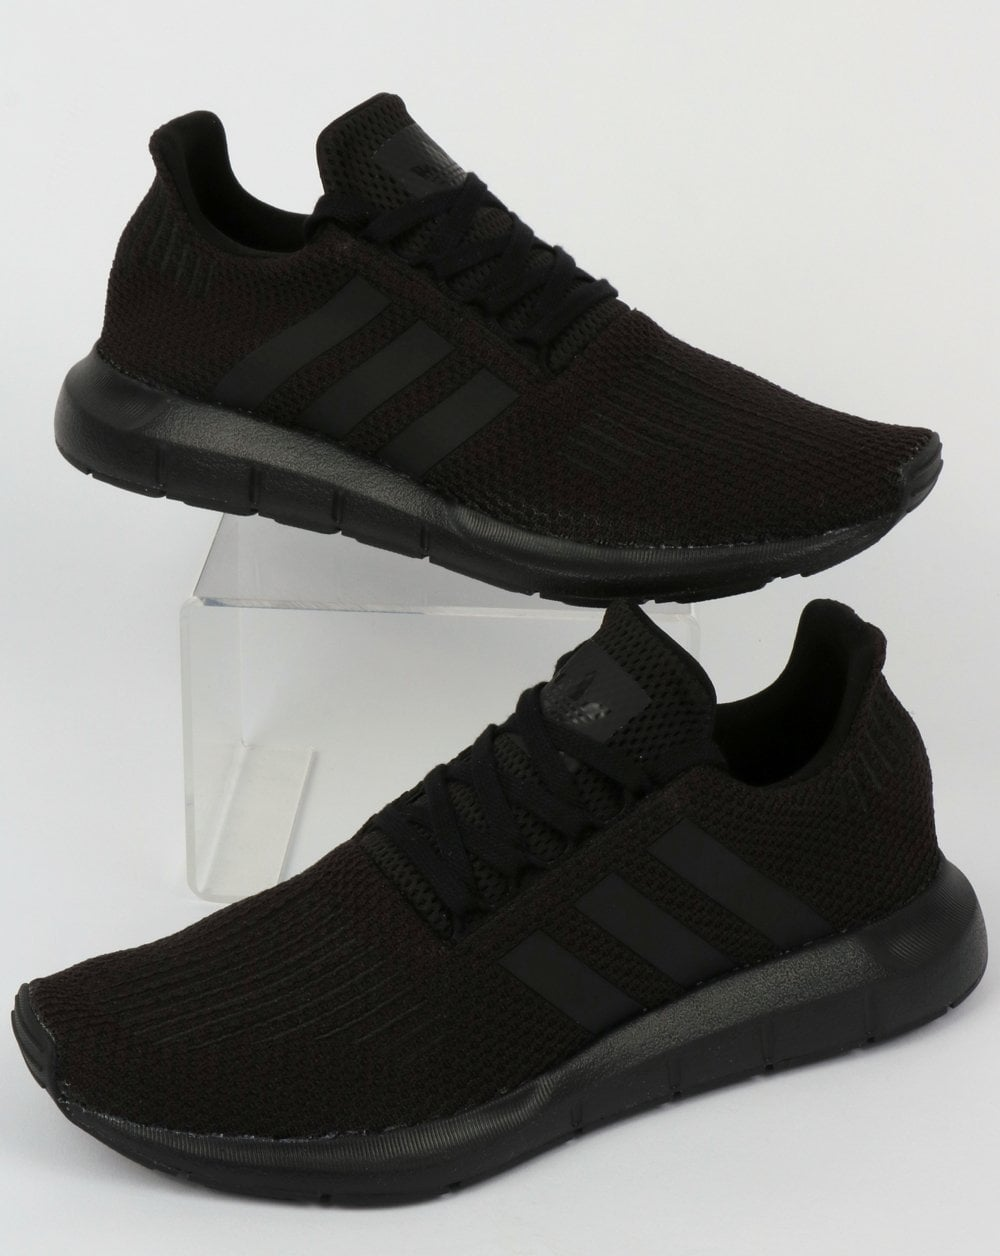 adidas originals swift trainer black